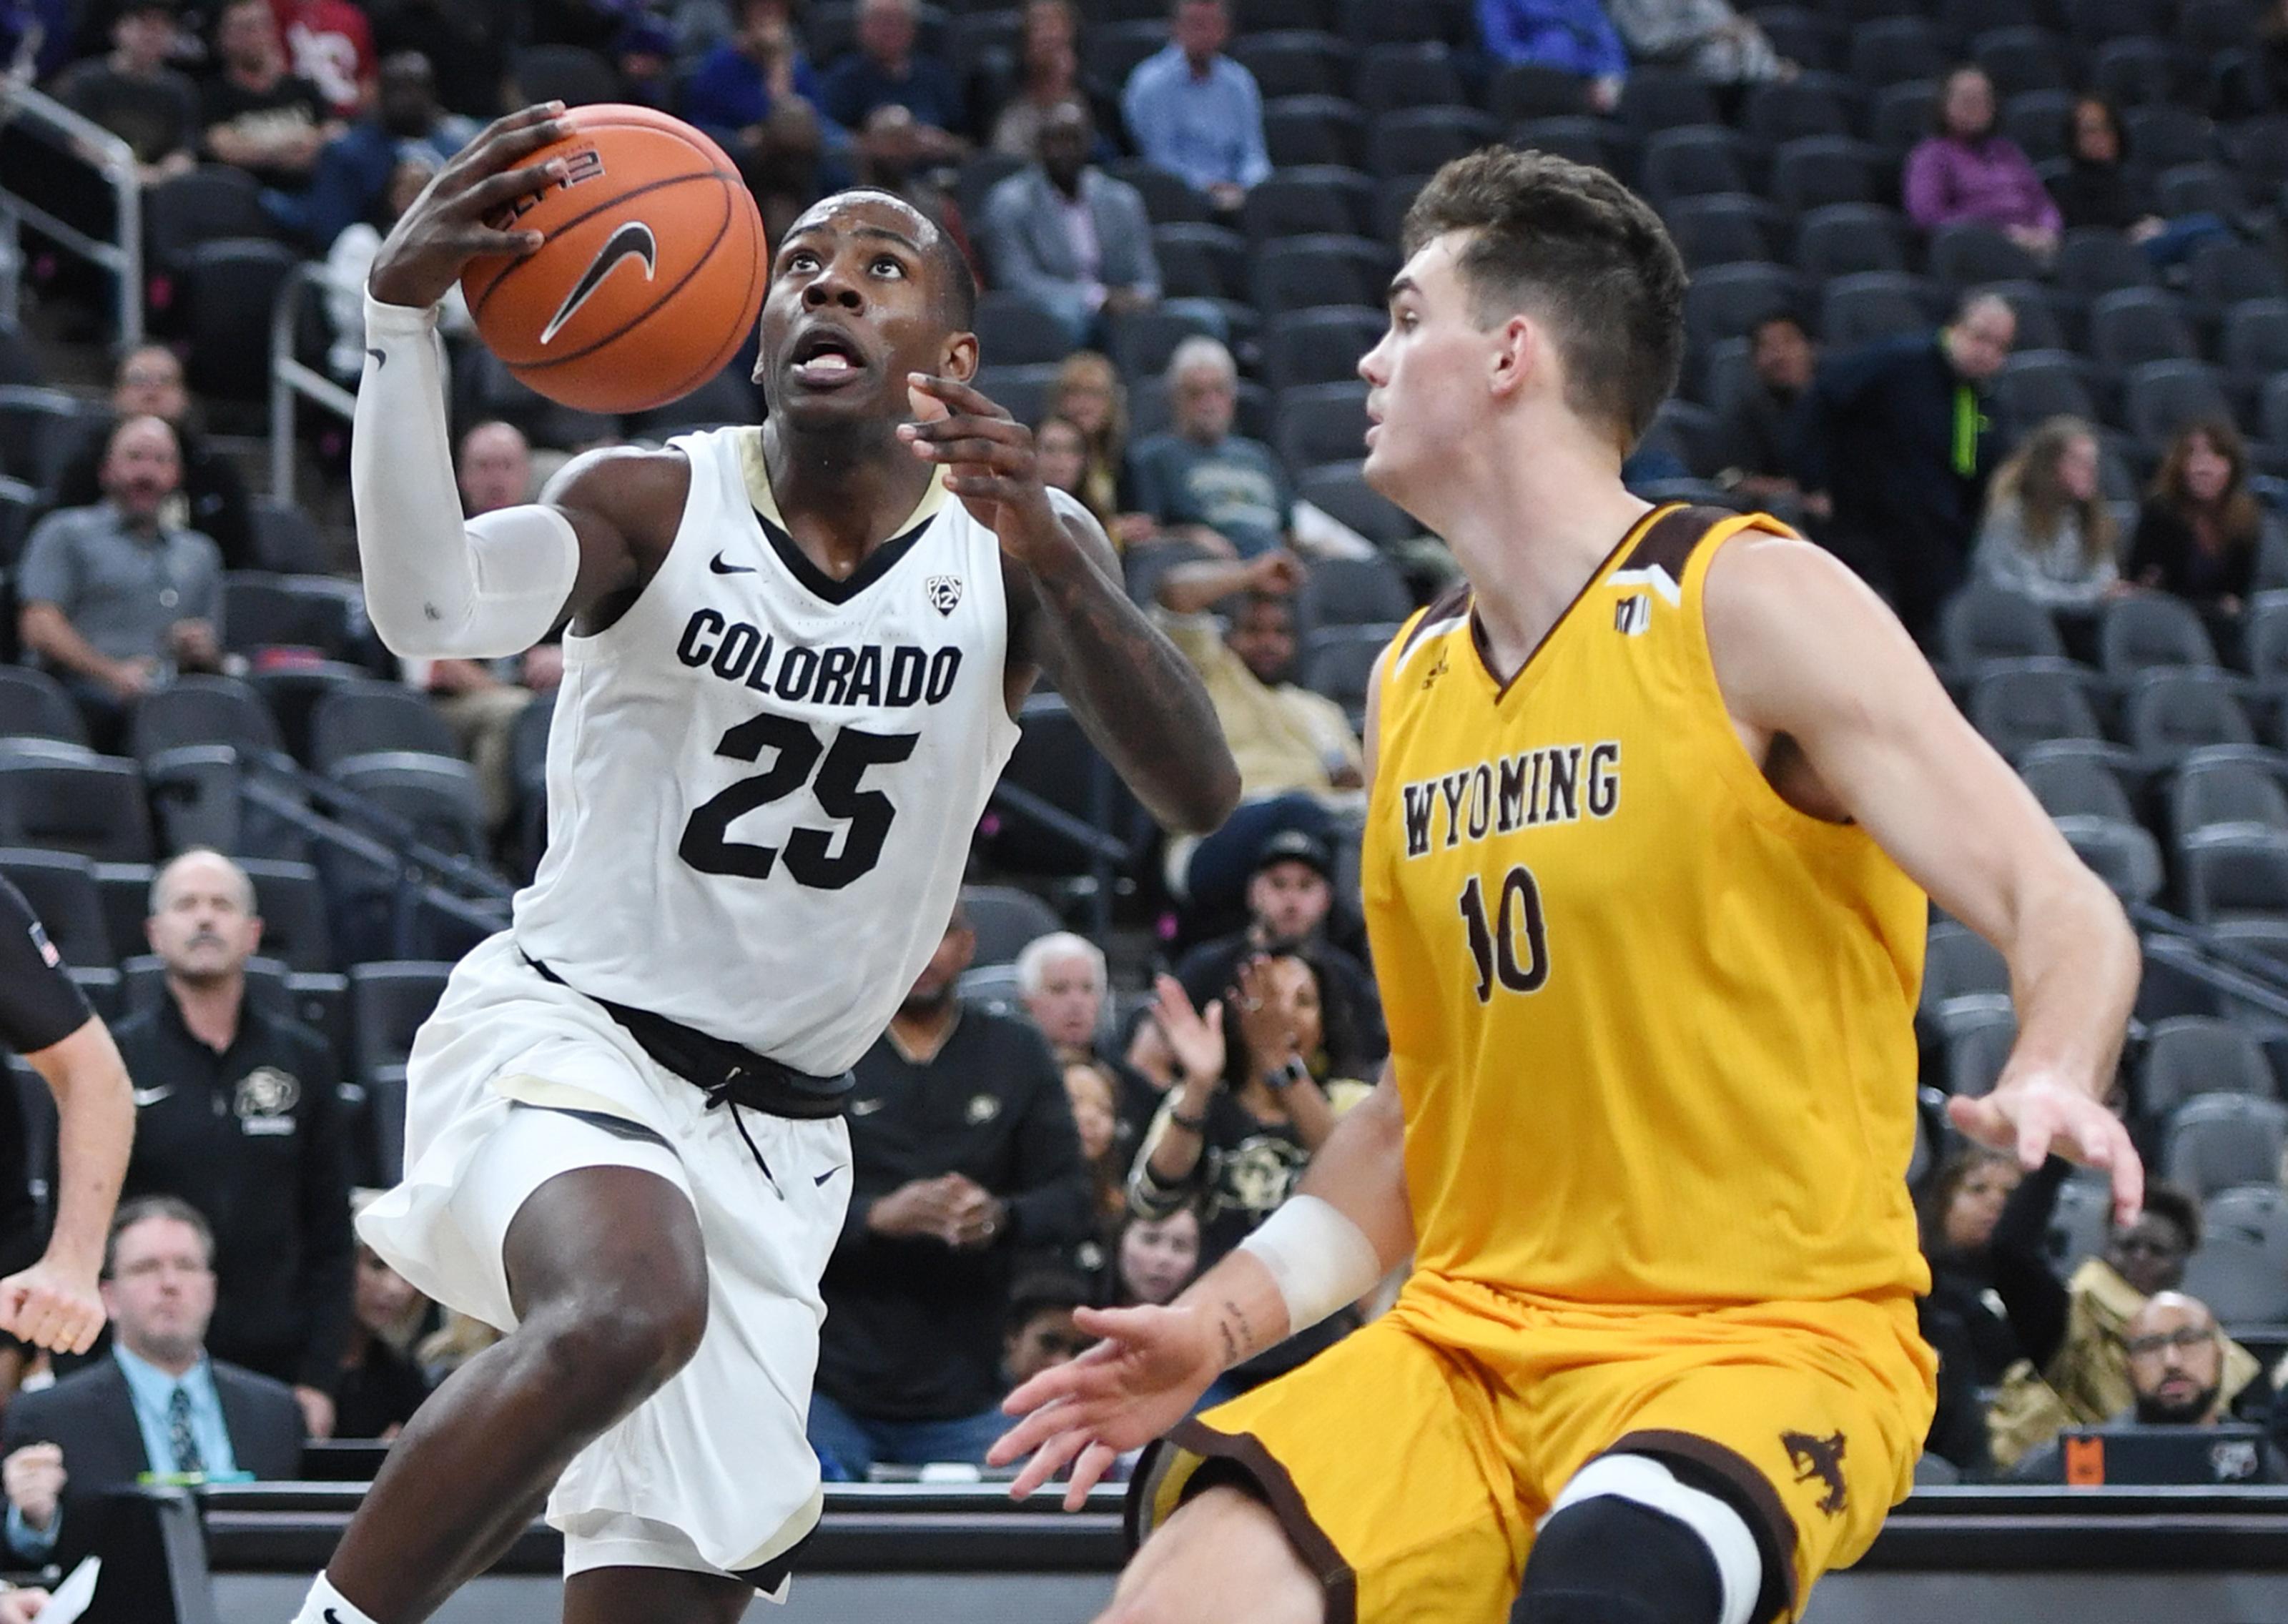 Colorado vs. USC: 2019-20 college basketball preview, TV schedule